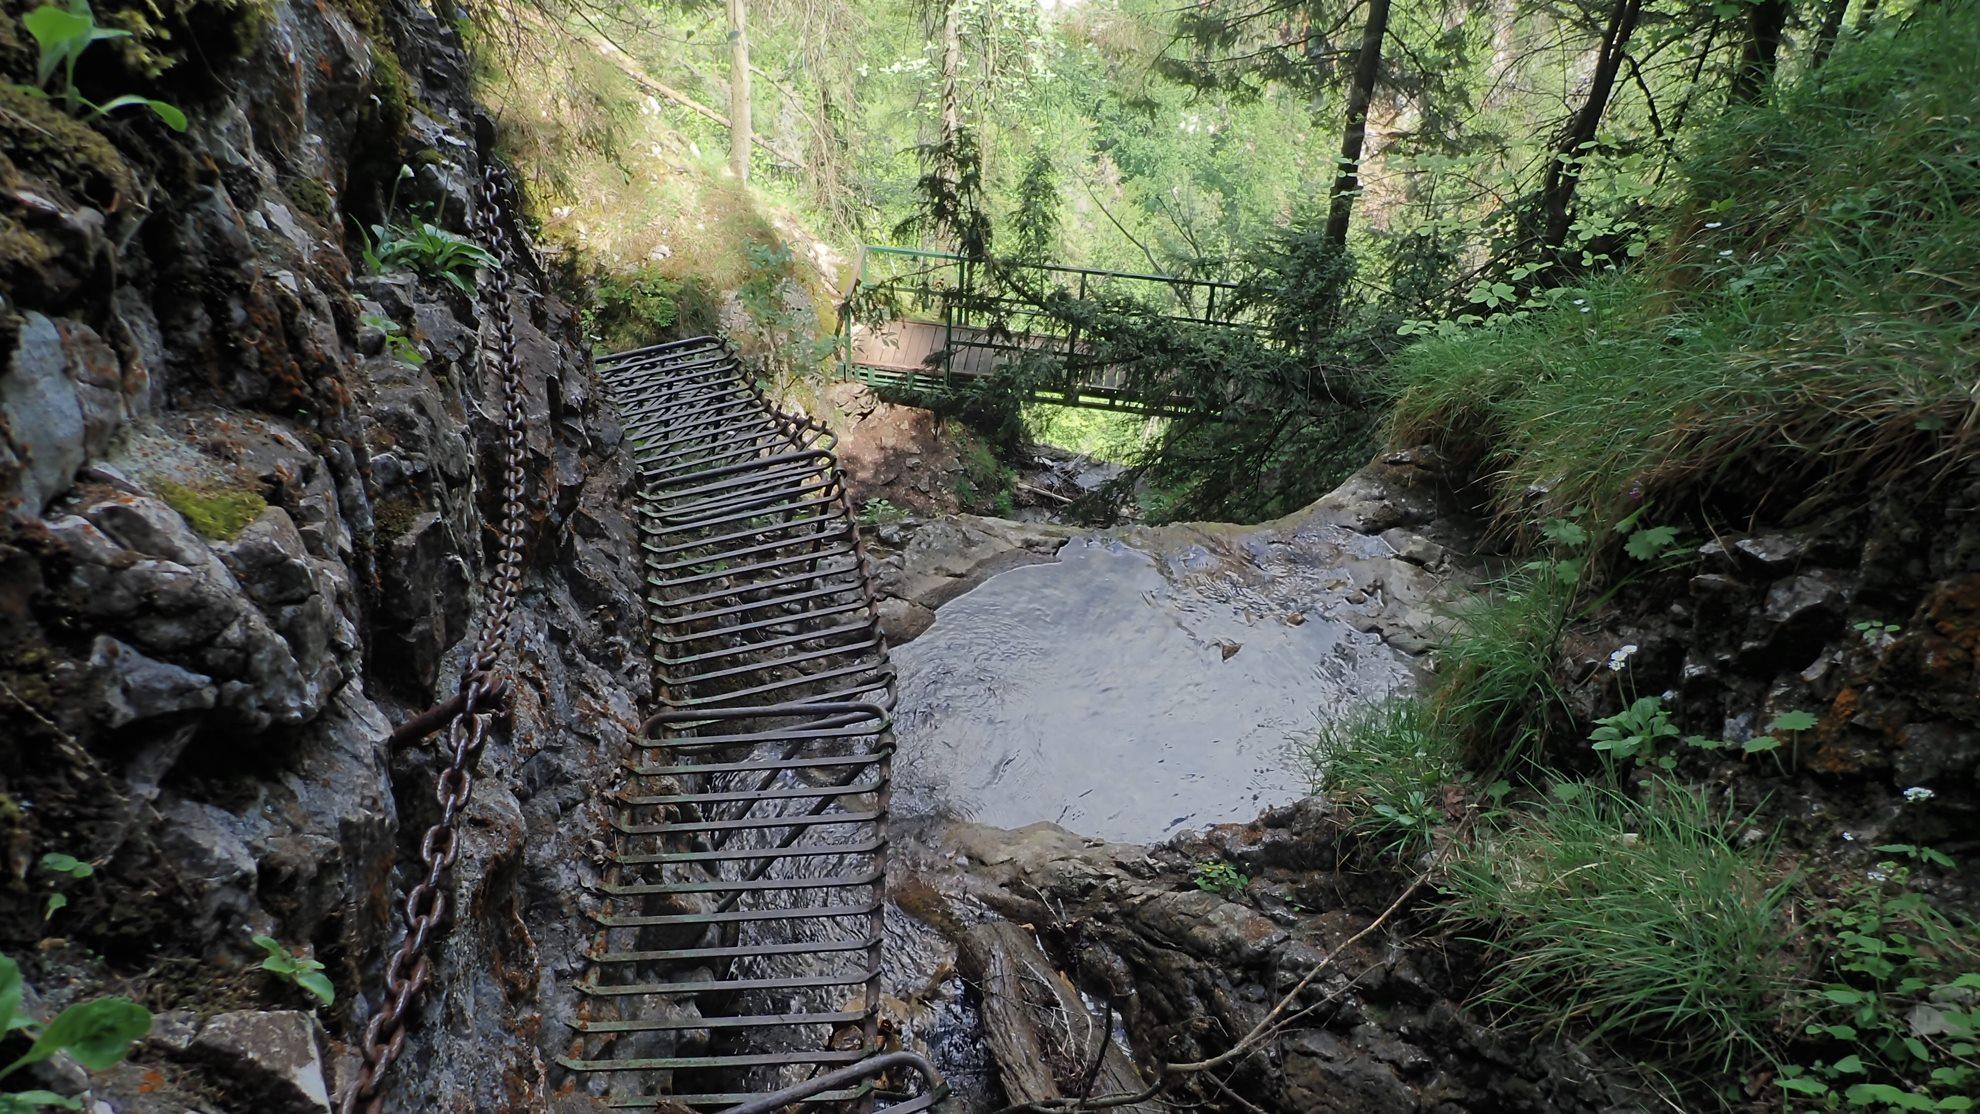 Solymos-völgy túra (Sokolia dolina)-9